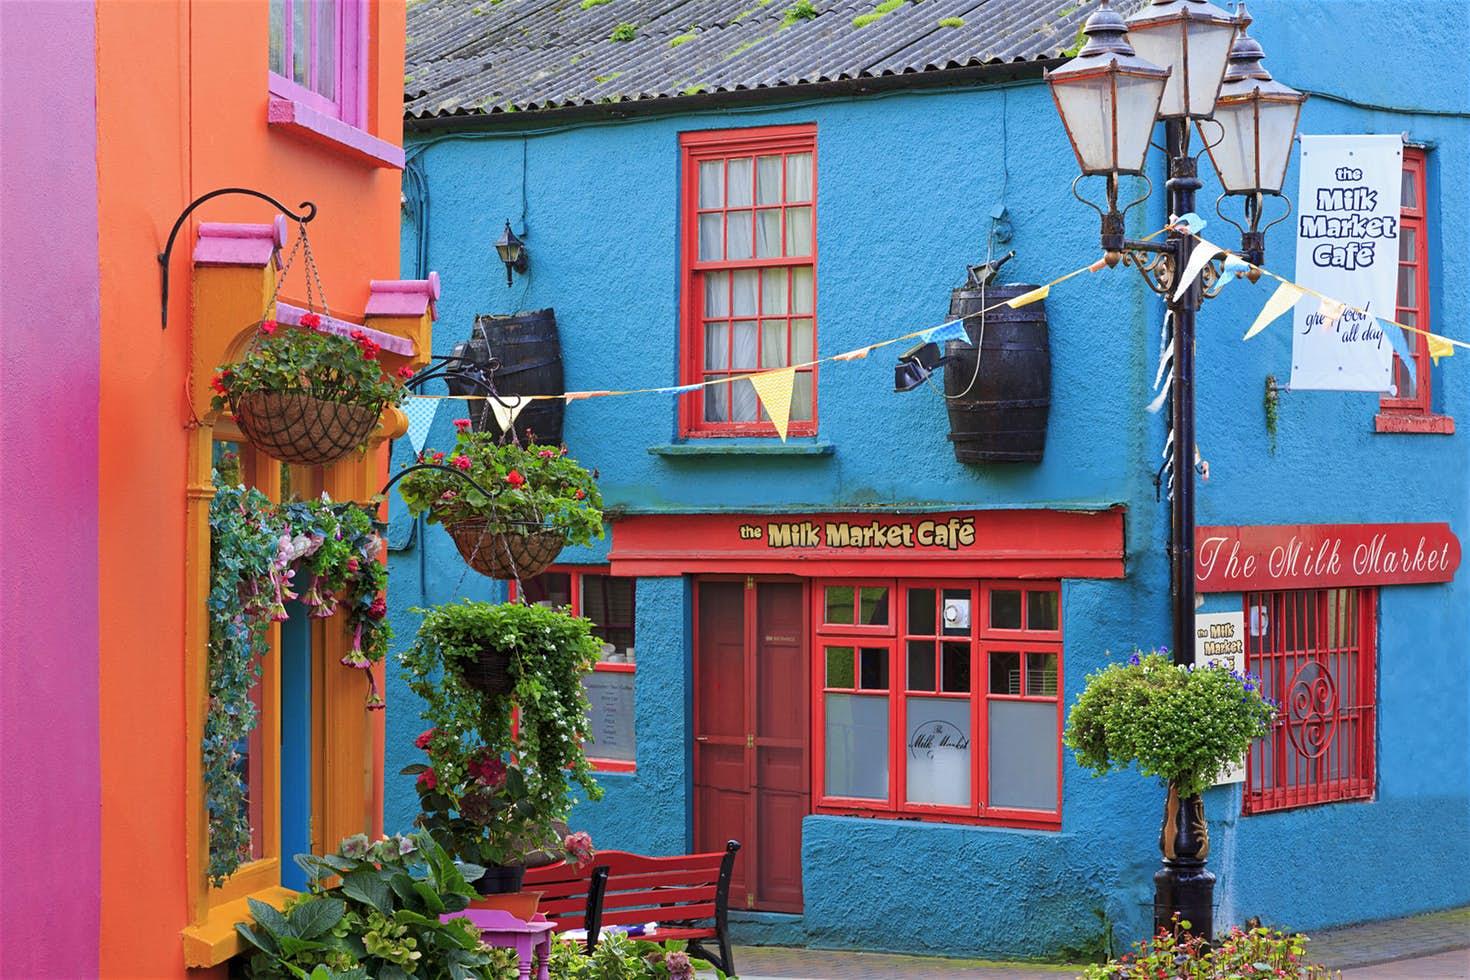 Places that pop: 10 of Europe's most colourful destinations https://t.co/wmIvqEvhfr https://t.co/1Mz1GJ7hUm